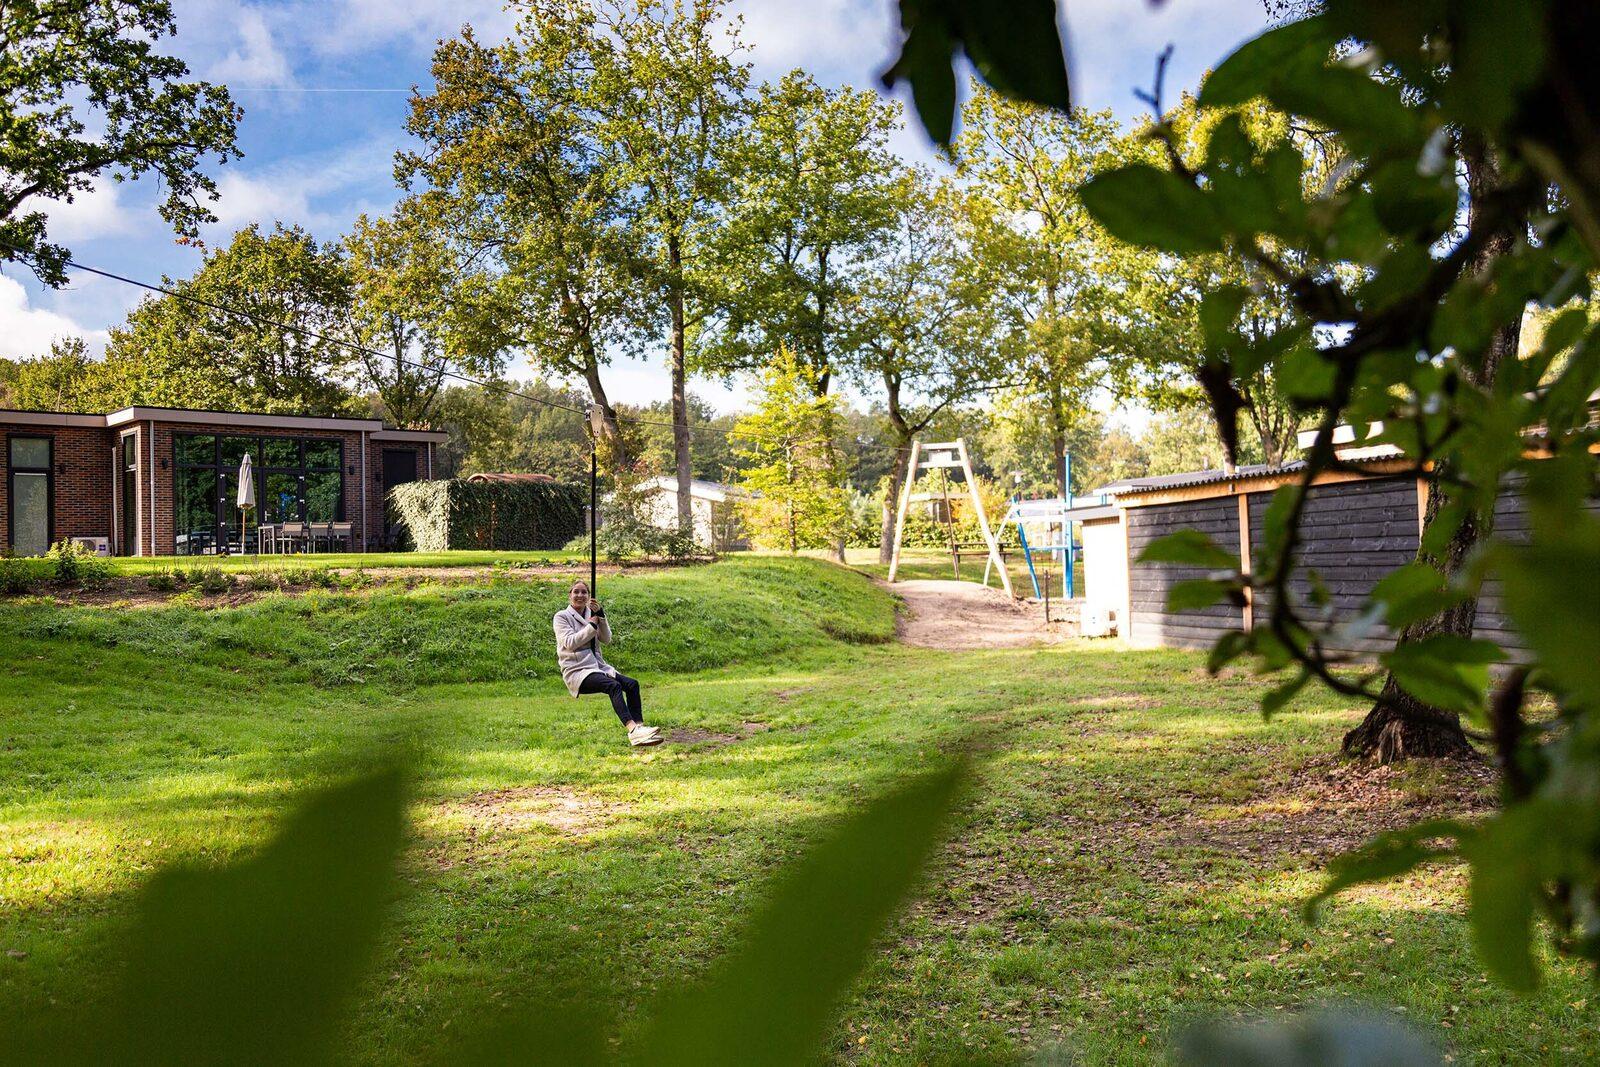 Expansion and renovation of Recreatiepark Beekbergen completed